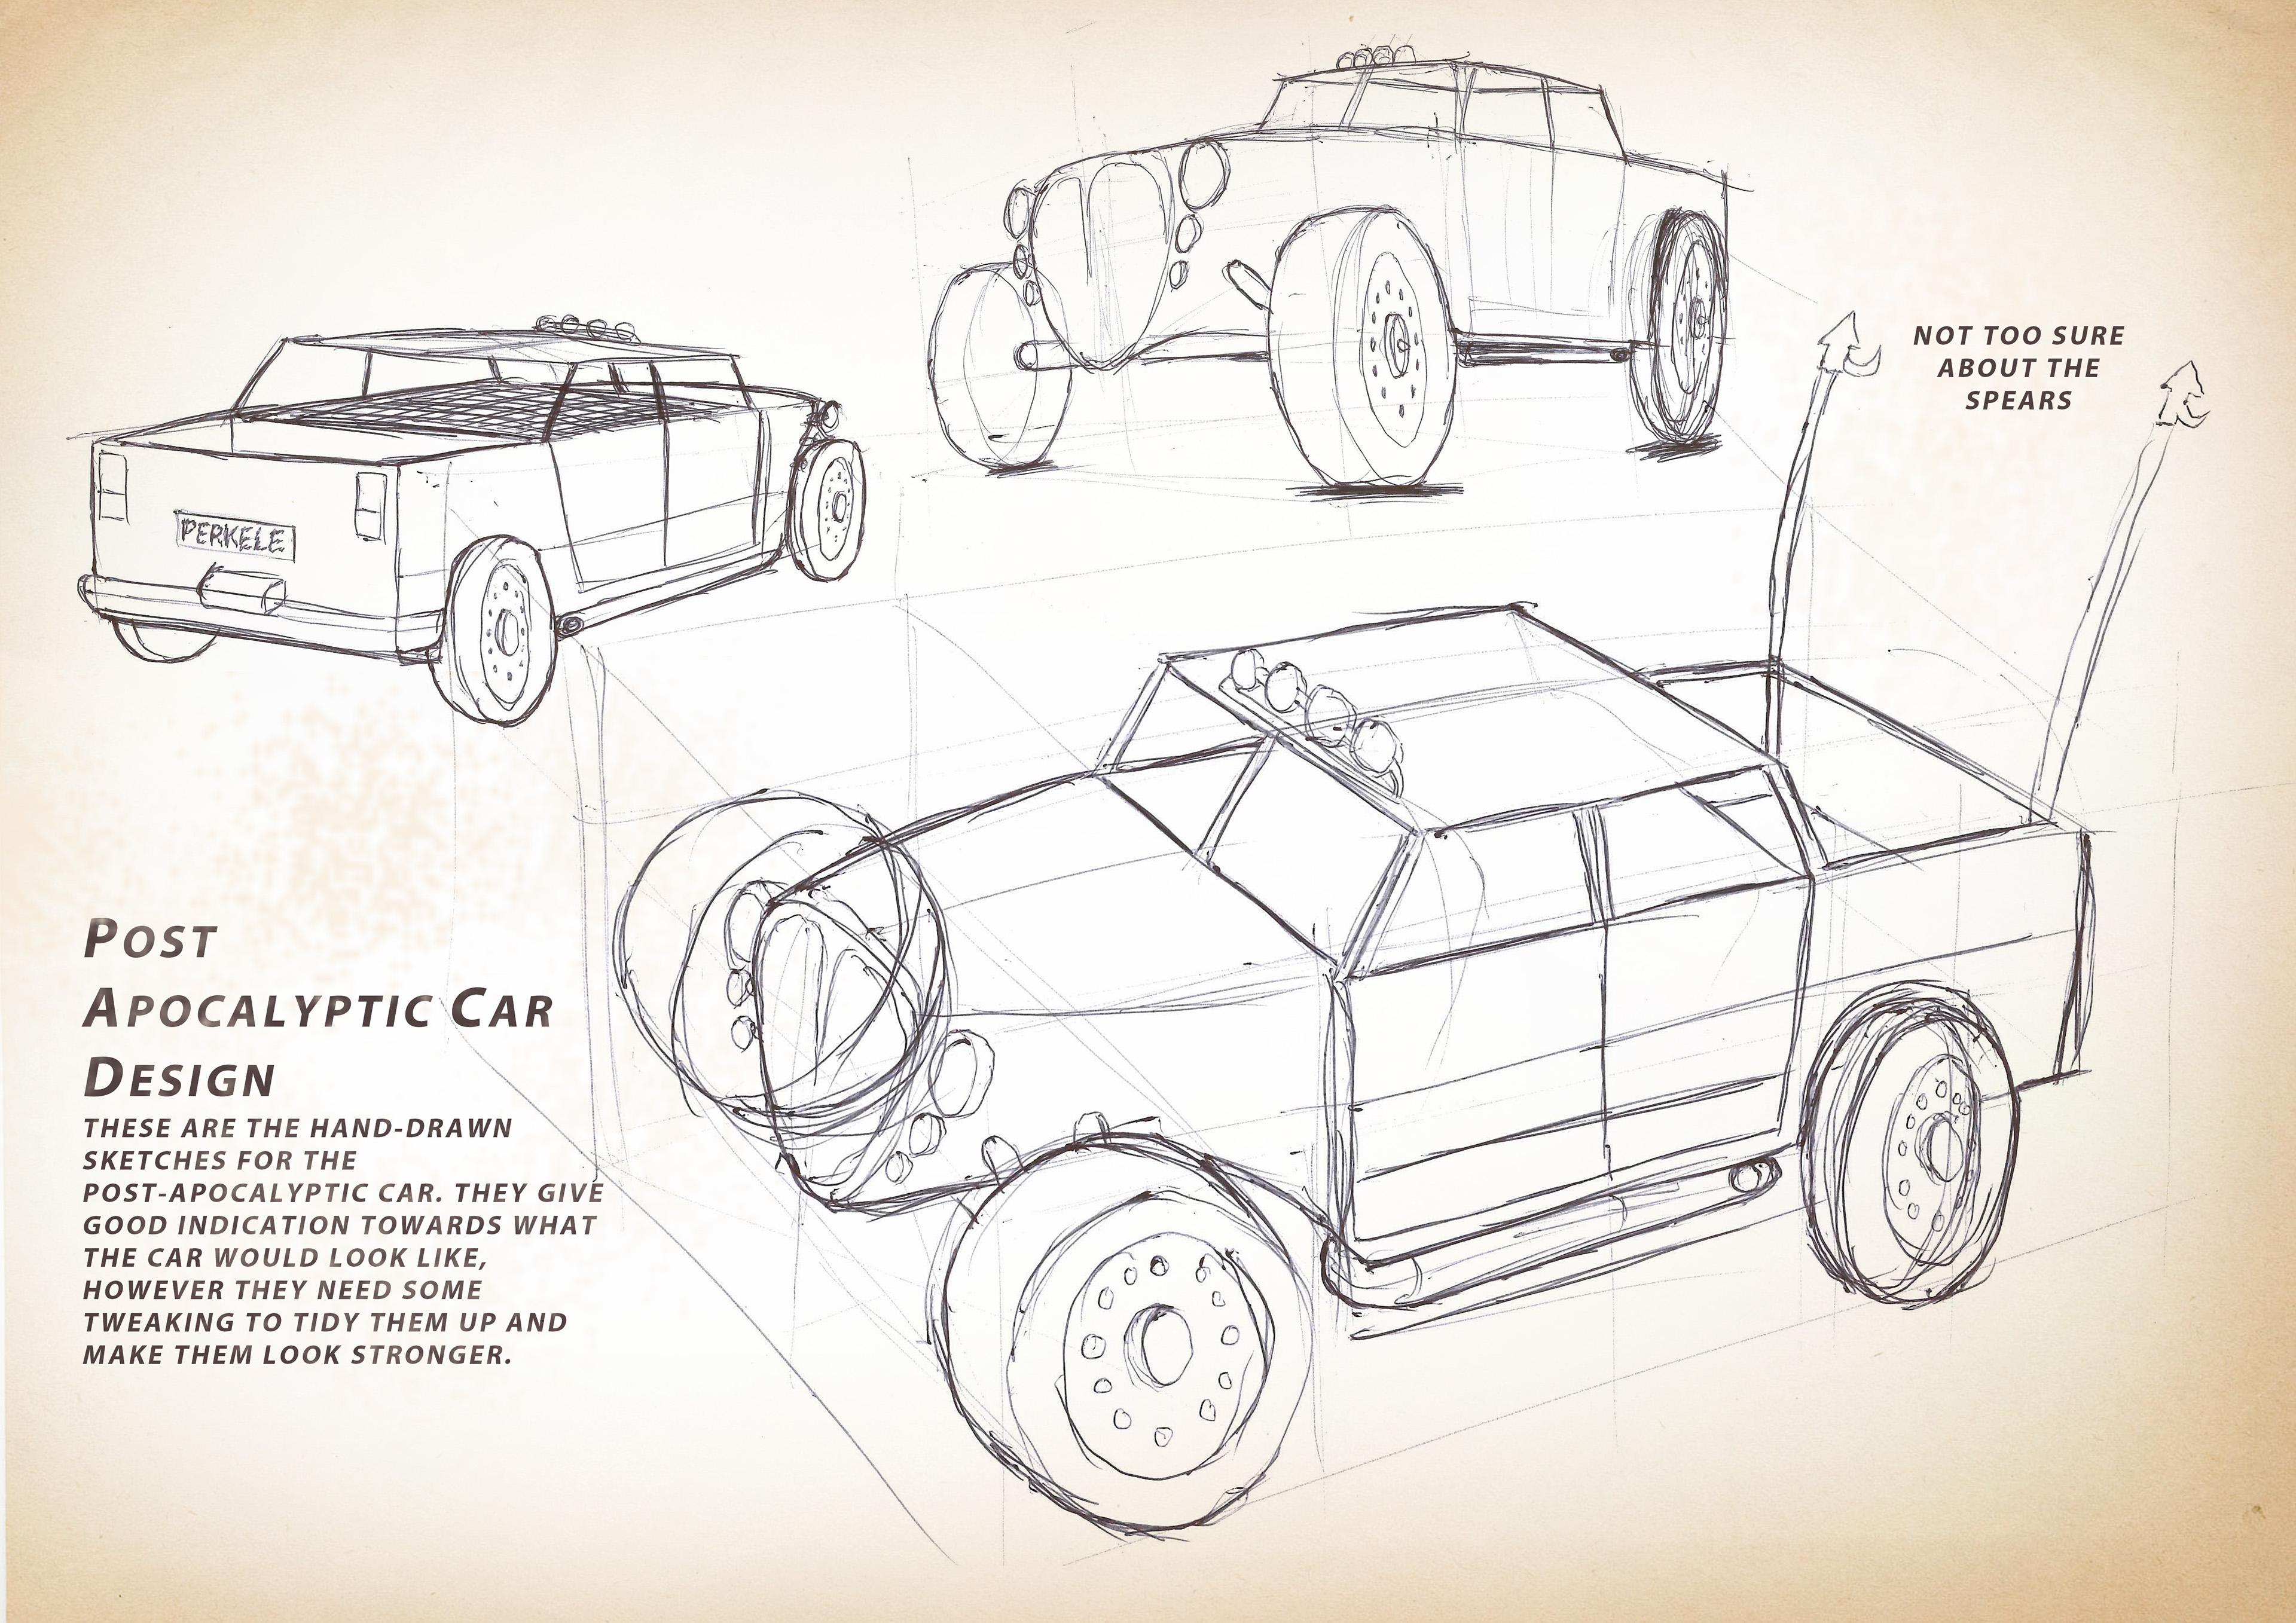 Post-Apocalyptic Car Design on Behance